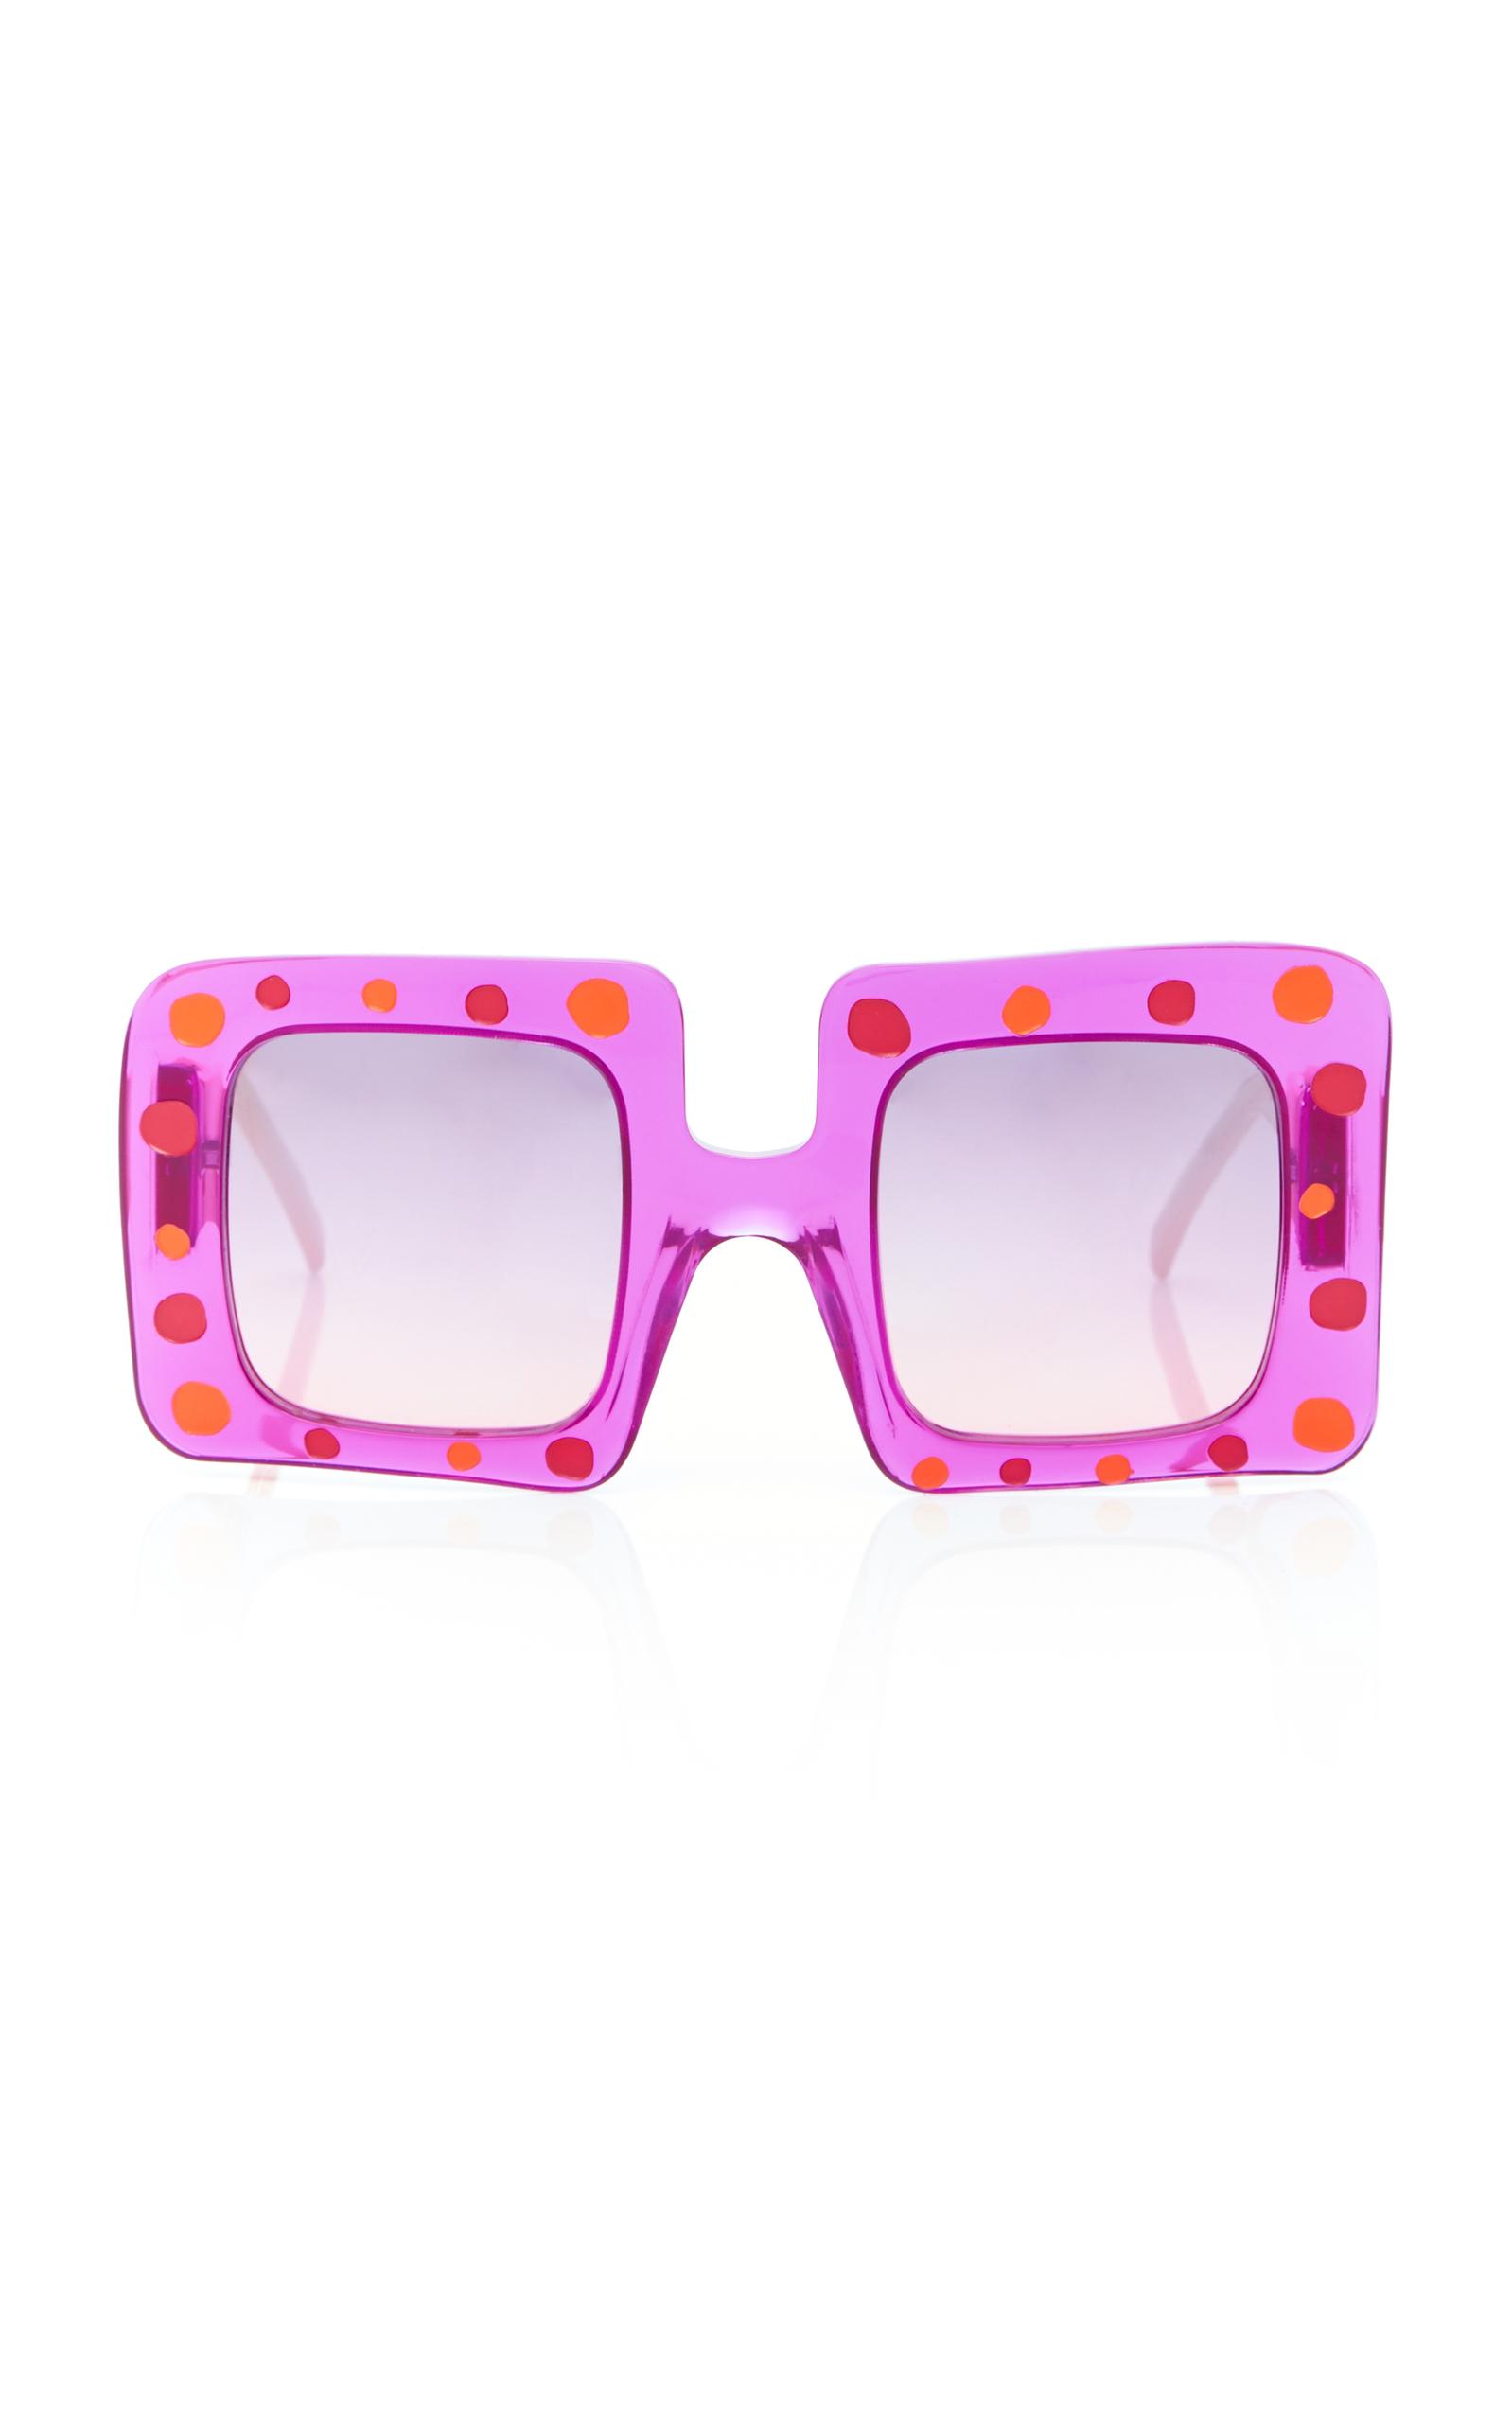 02a62a5675 Agatha Ruiz de la PradaDotty Sunglasses. CLOSE. Loading